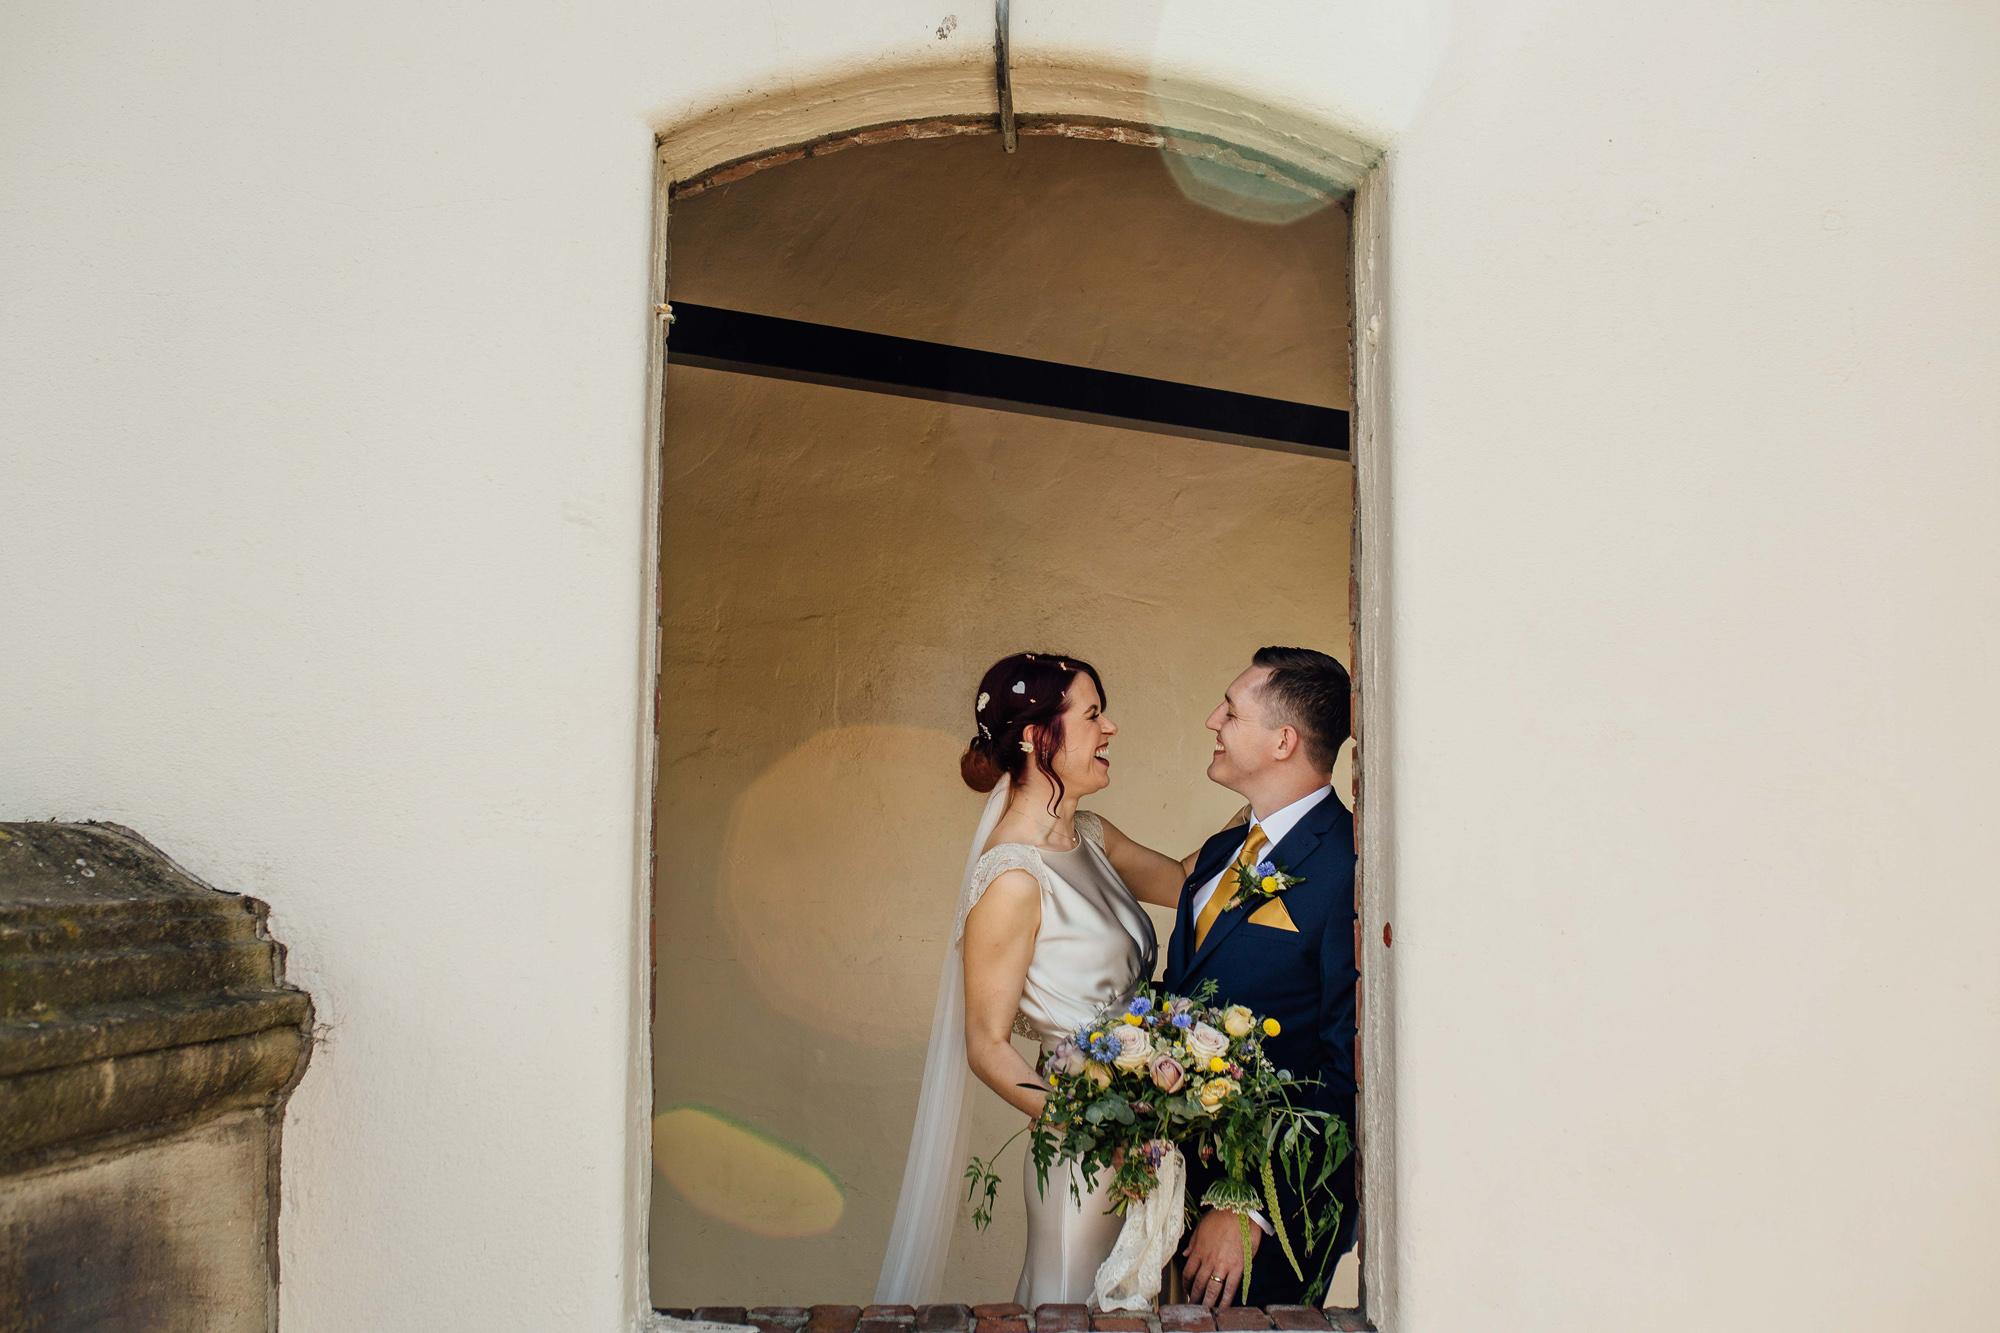 Sarah-Honeysuckle-Bias-Cut-Silk-Vintage-Inspired-Wedding-Gown-Sheffield-Wedding-Kate-Beaumont-31.jpg